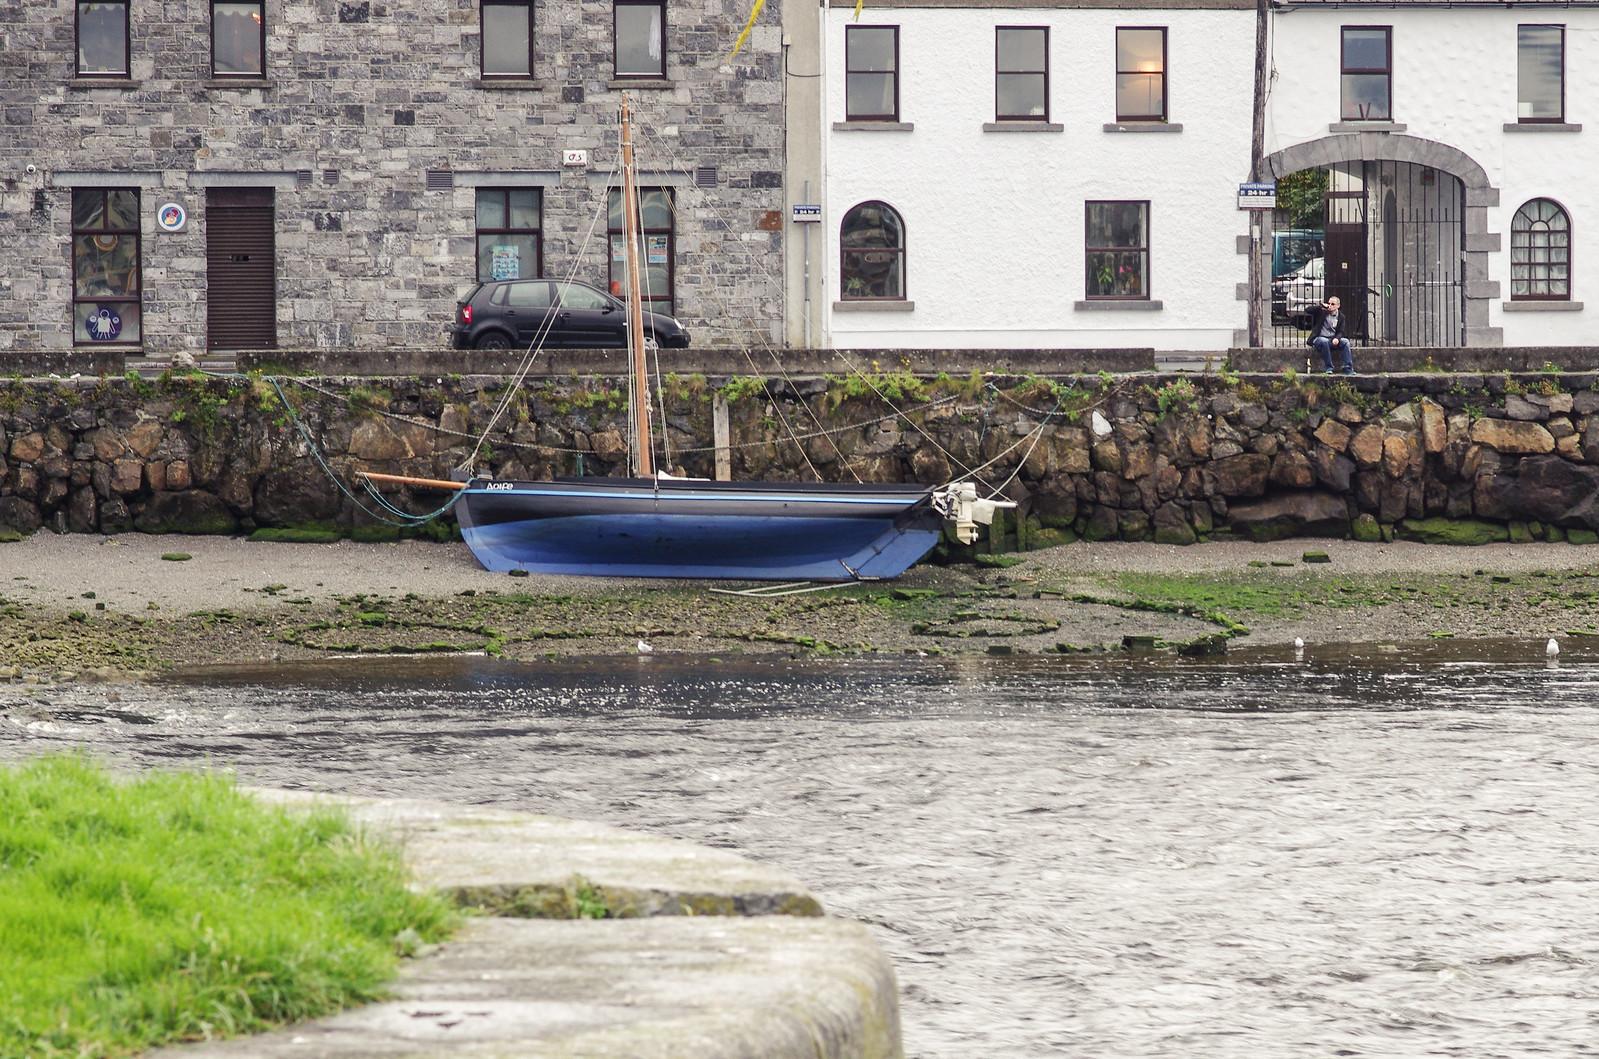 Galway, un vent de Liberté - Carnet de voyage en Irlande